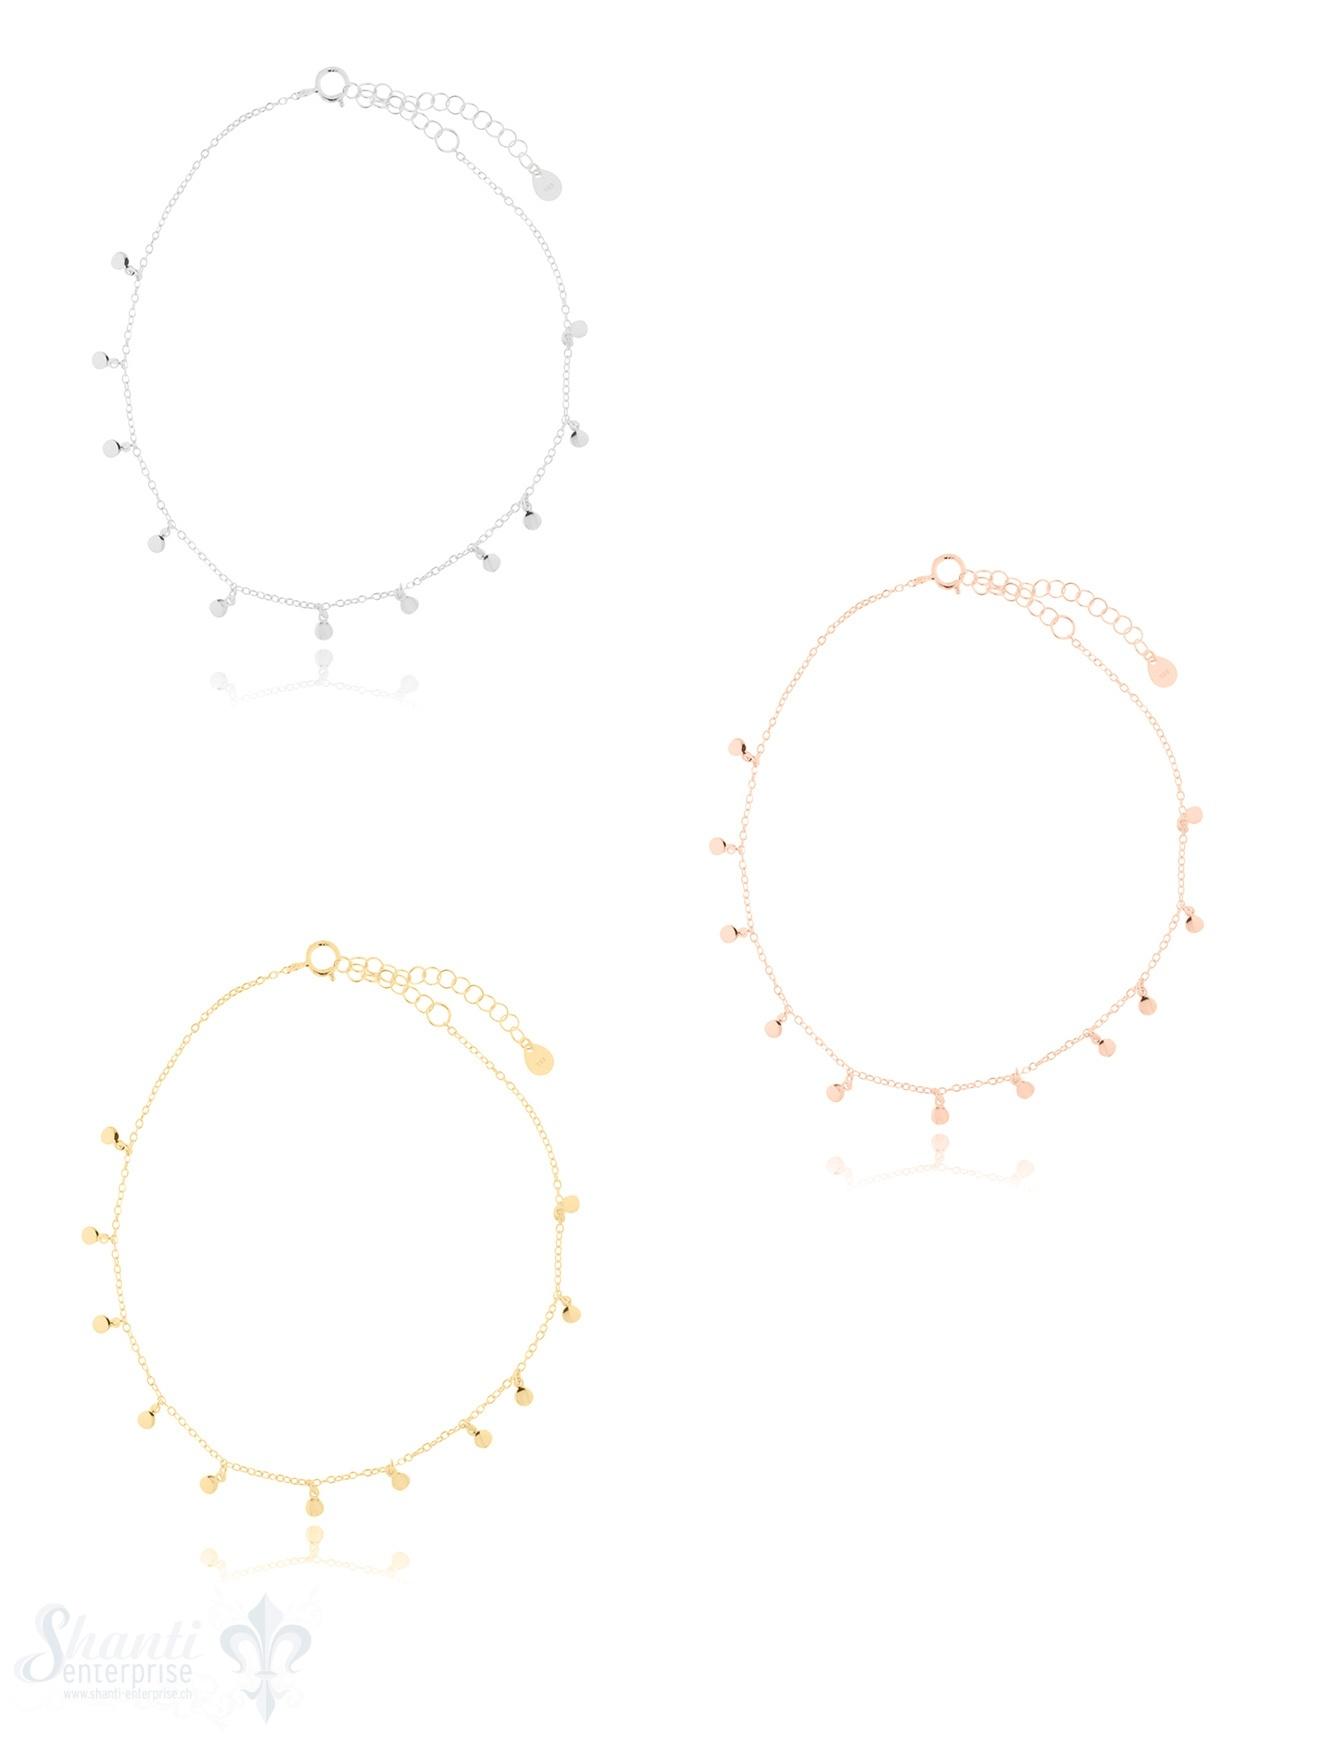 Fussketteli Silber Anker fein mit Mini-Plaquetten